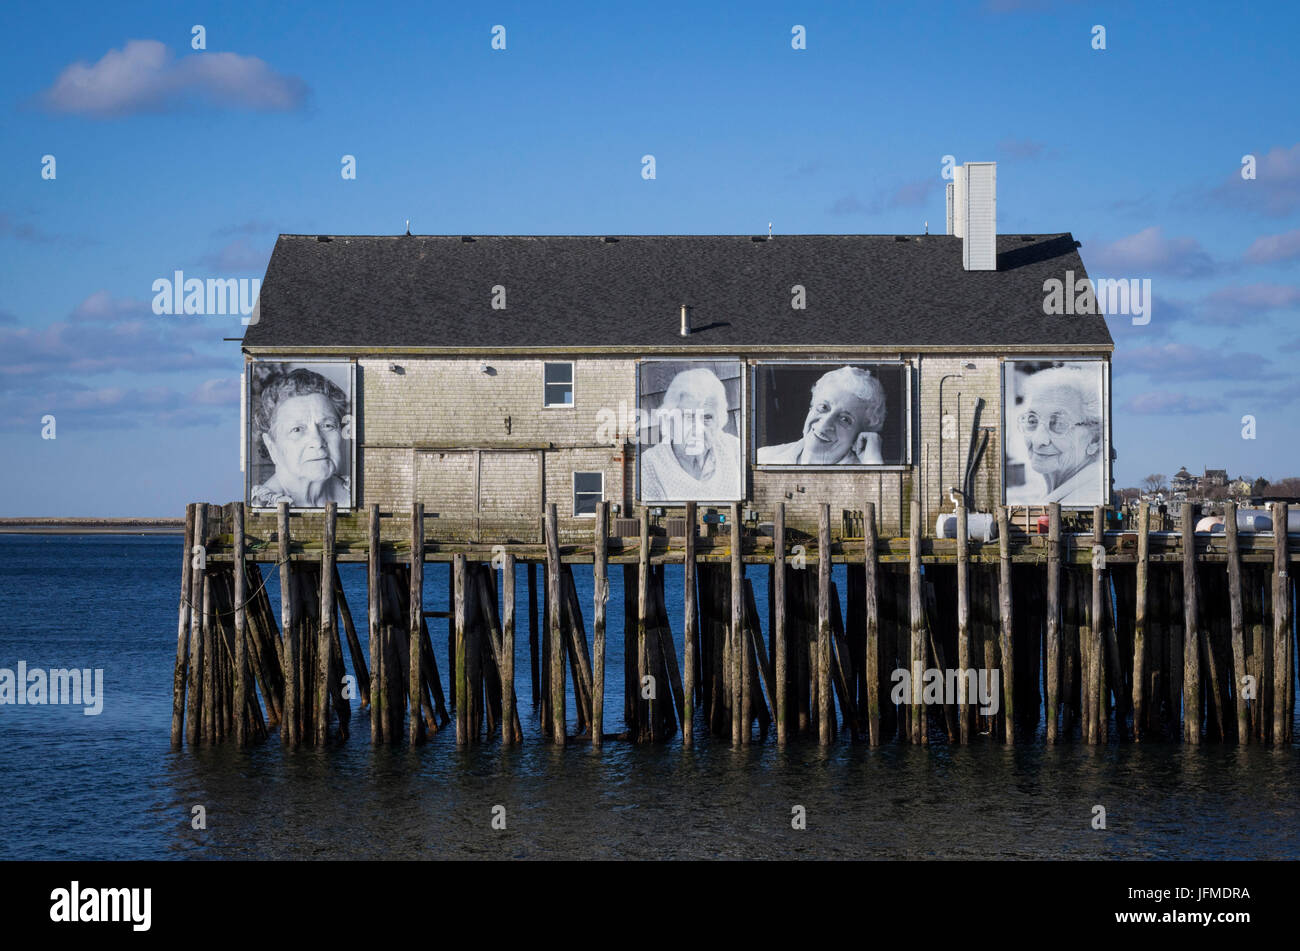 USA, Massachusetts, Cape Cod, Provincetown, Provincetown Pier, photos of fishermen's wives - Stock Image